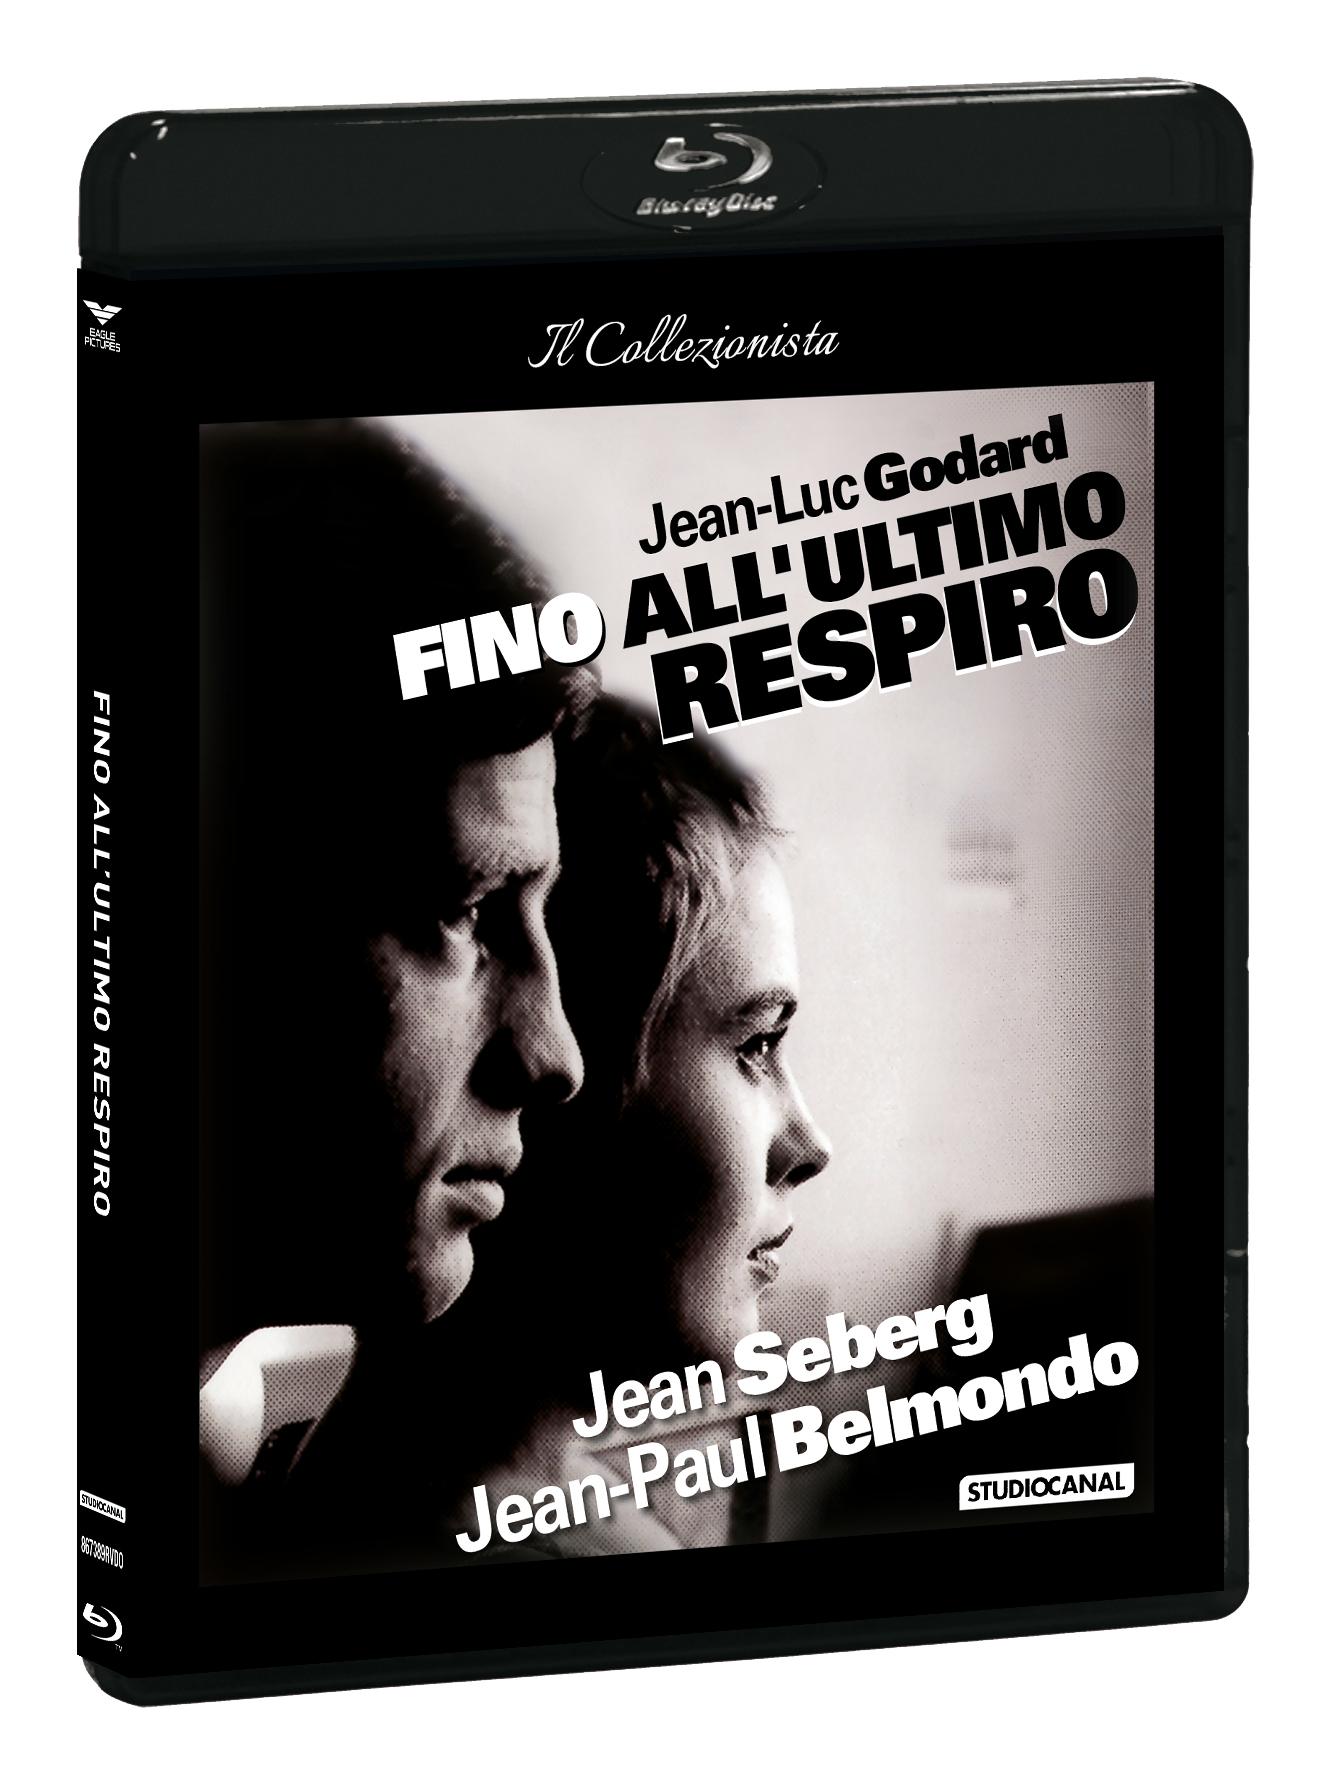 FINO ALL'ULTIMO RESPIRO (BLU-RAY+DVD)